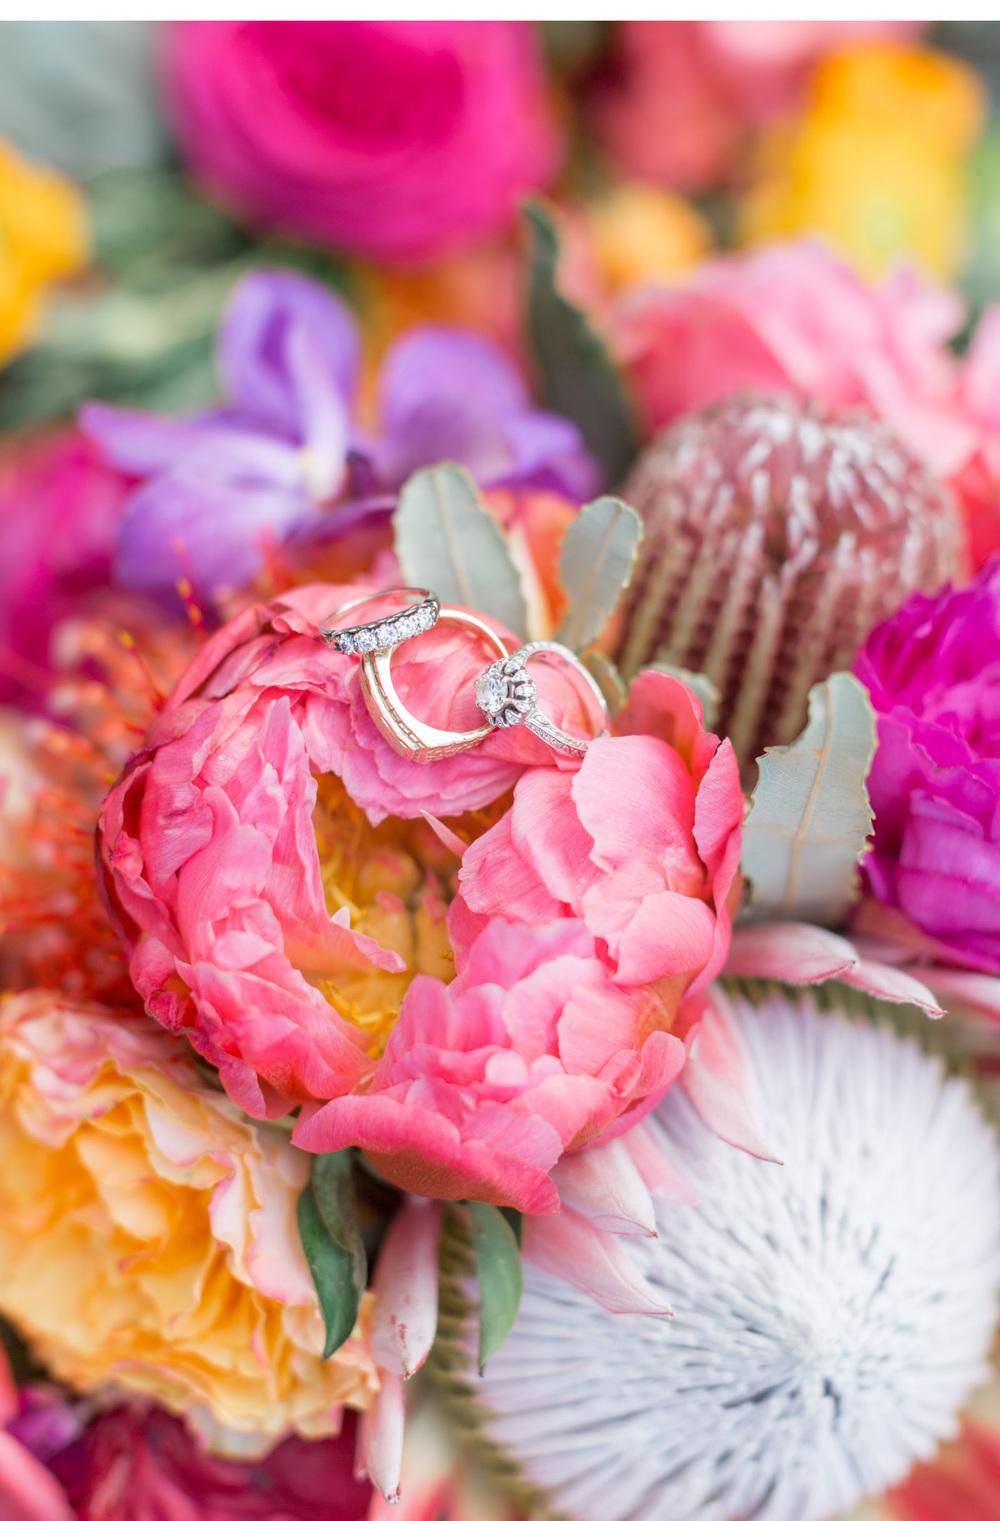 Natalie-Schutt-Photography--Style-Me-Pretty-Maui-Wedding_04.jpg